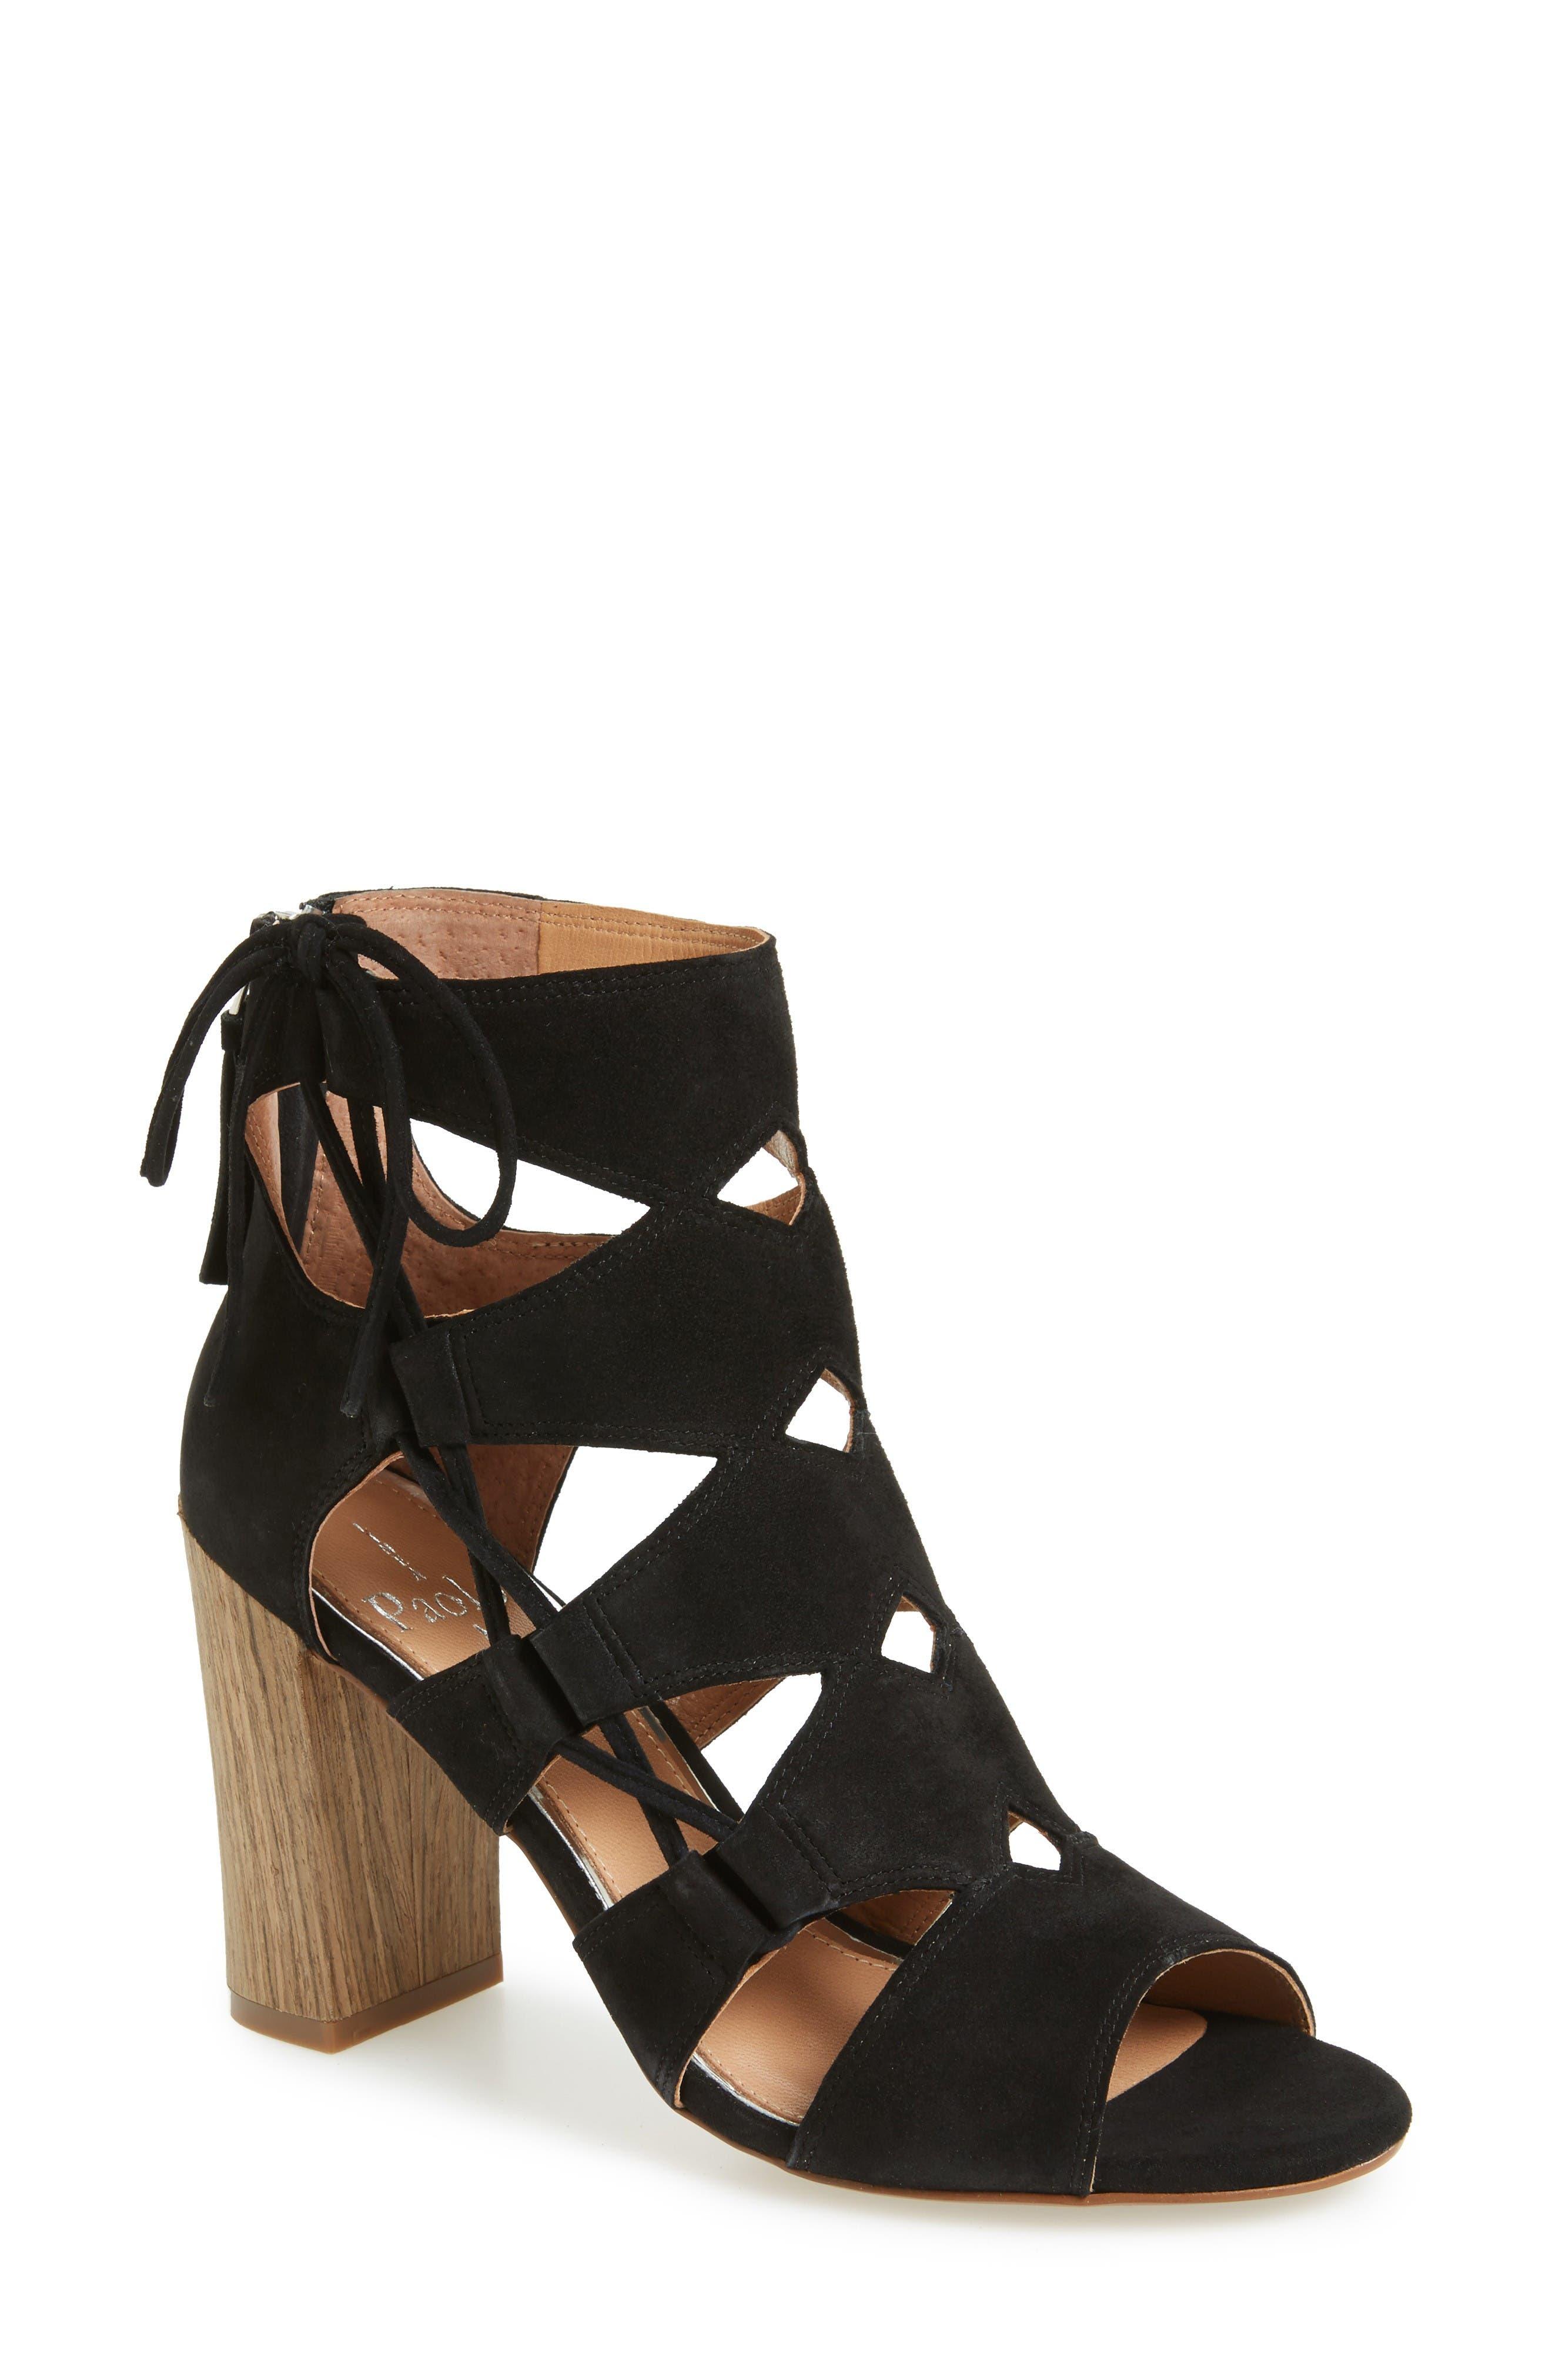 Main Image - Linea Paolo Hawley Cutout Sandal (Women)